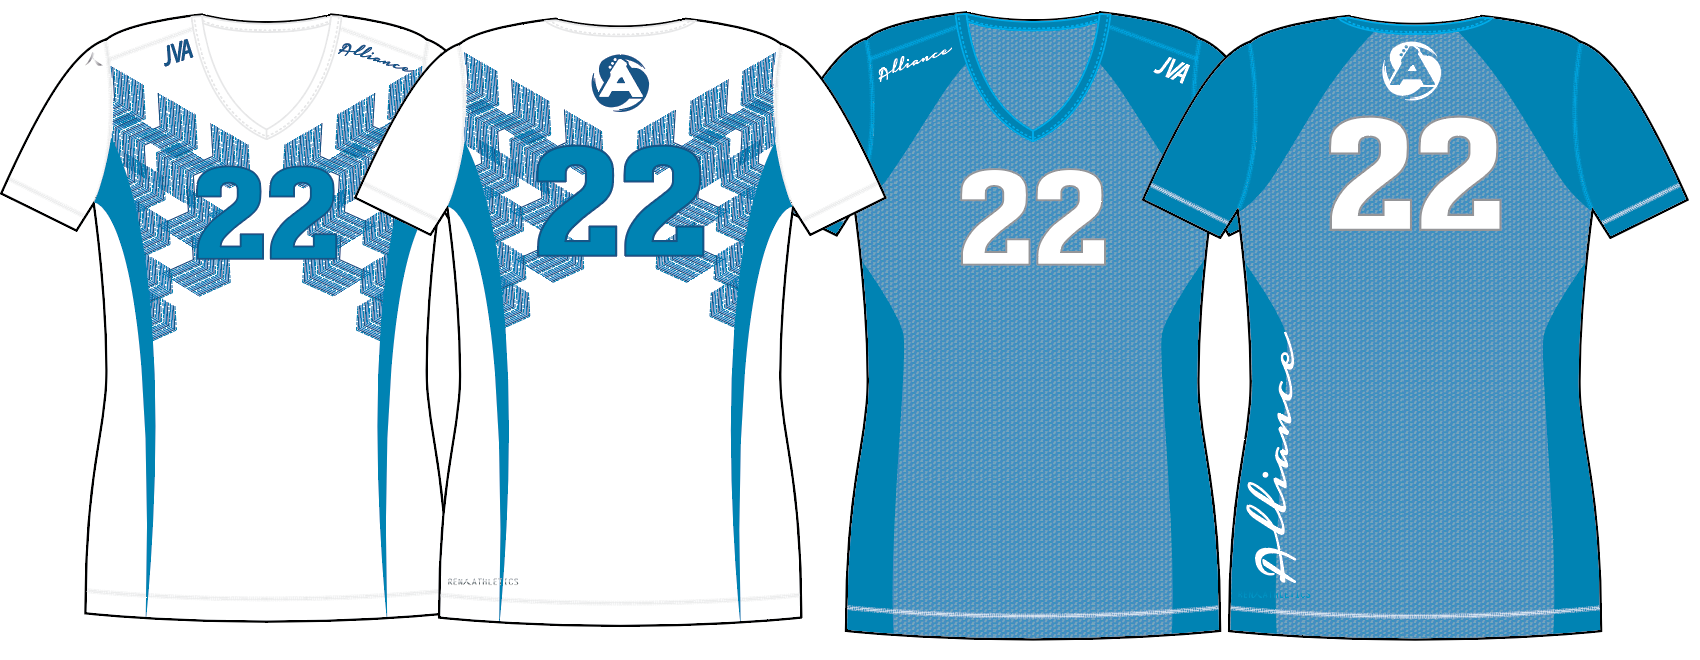 Alliance Volleyball Custom Uniforms